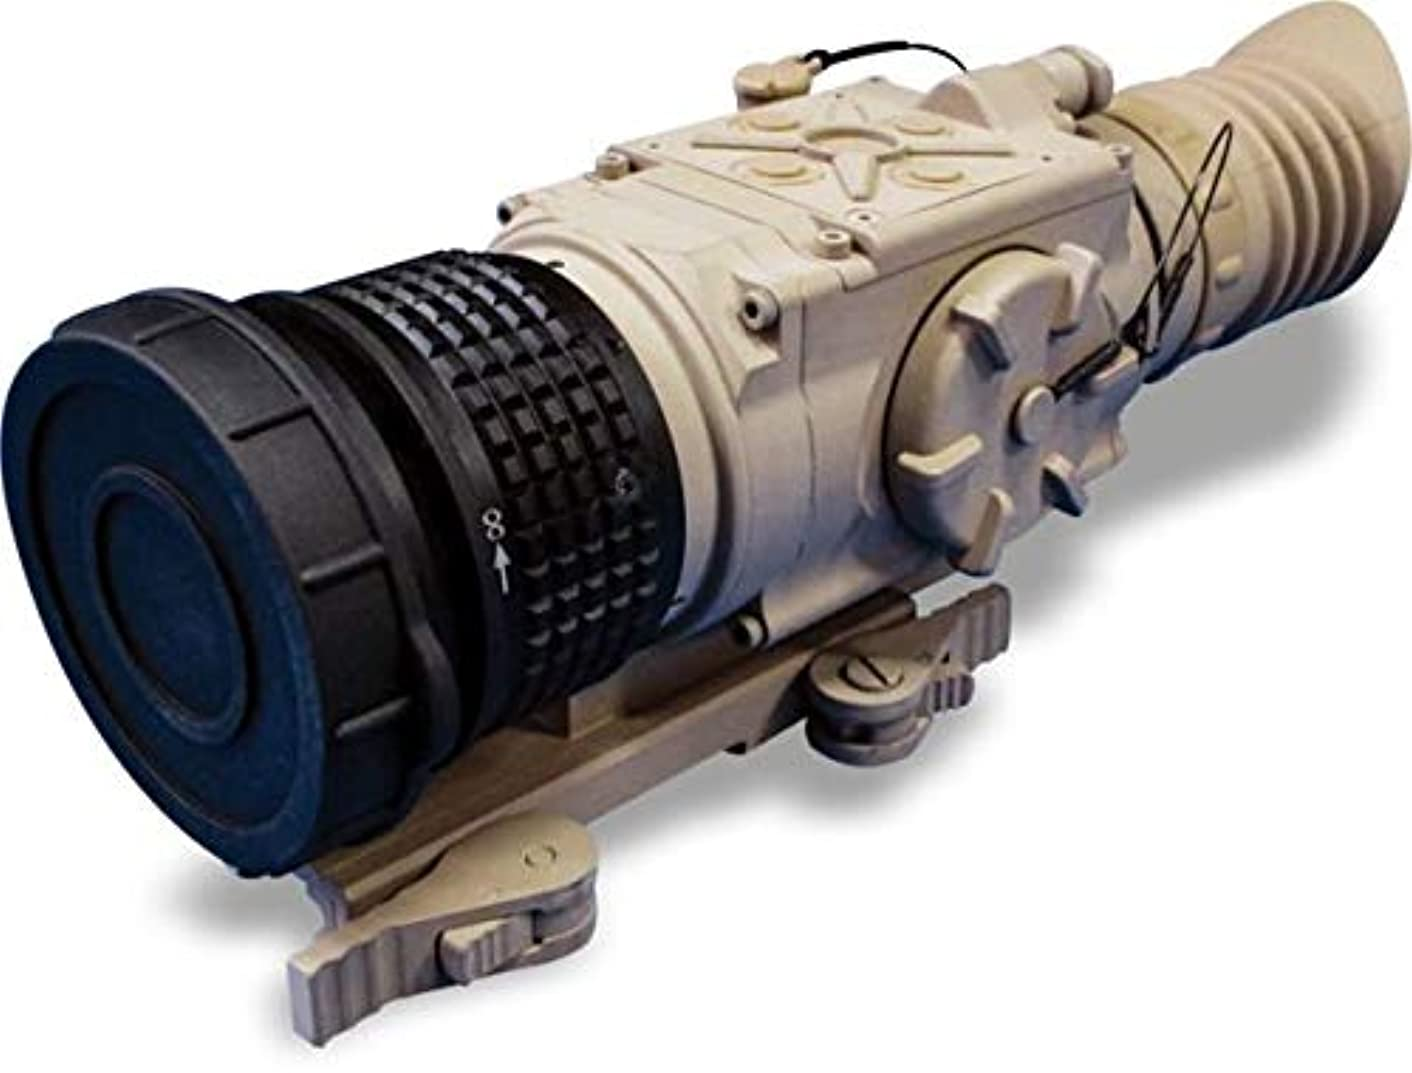 Armasight Zeus 336 3-12x42 Thermal Imaging Weapon Sight, FLIR Tau 2 336x256 17 TAT163WN7OP0032